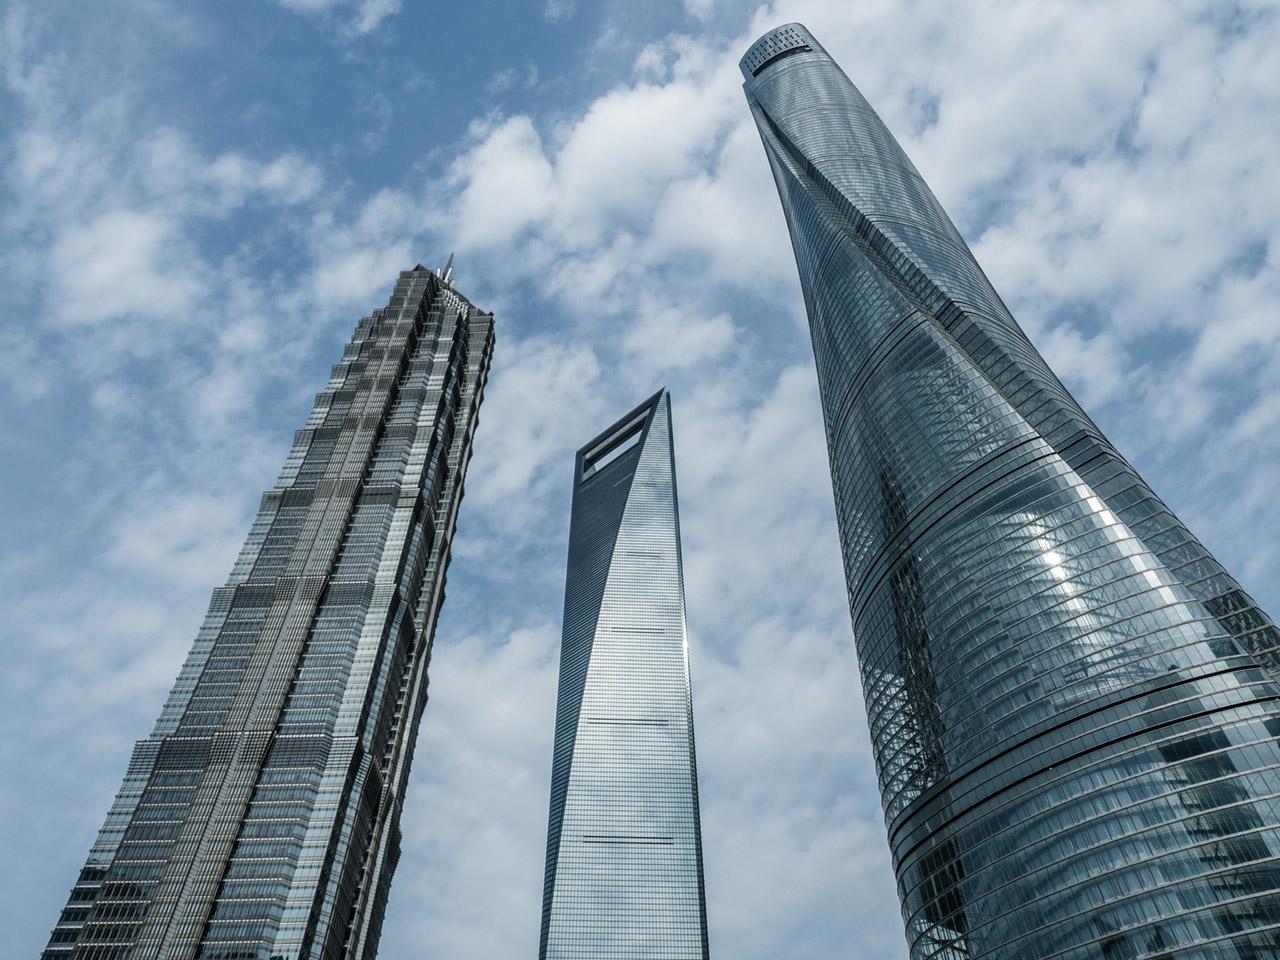 Marvel As Urban Climbers Scale 2 073 Foot Tall Shanghai Tower